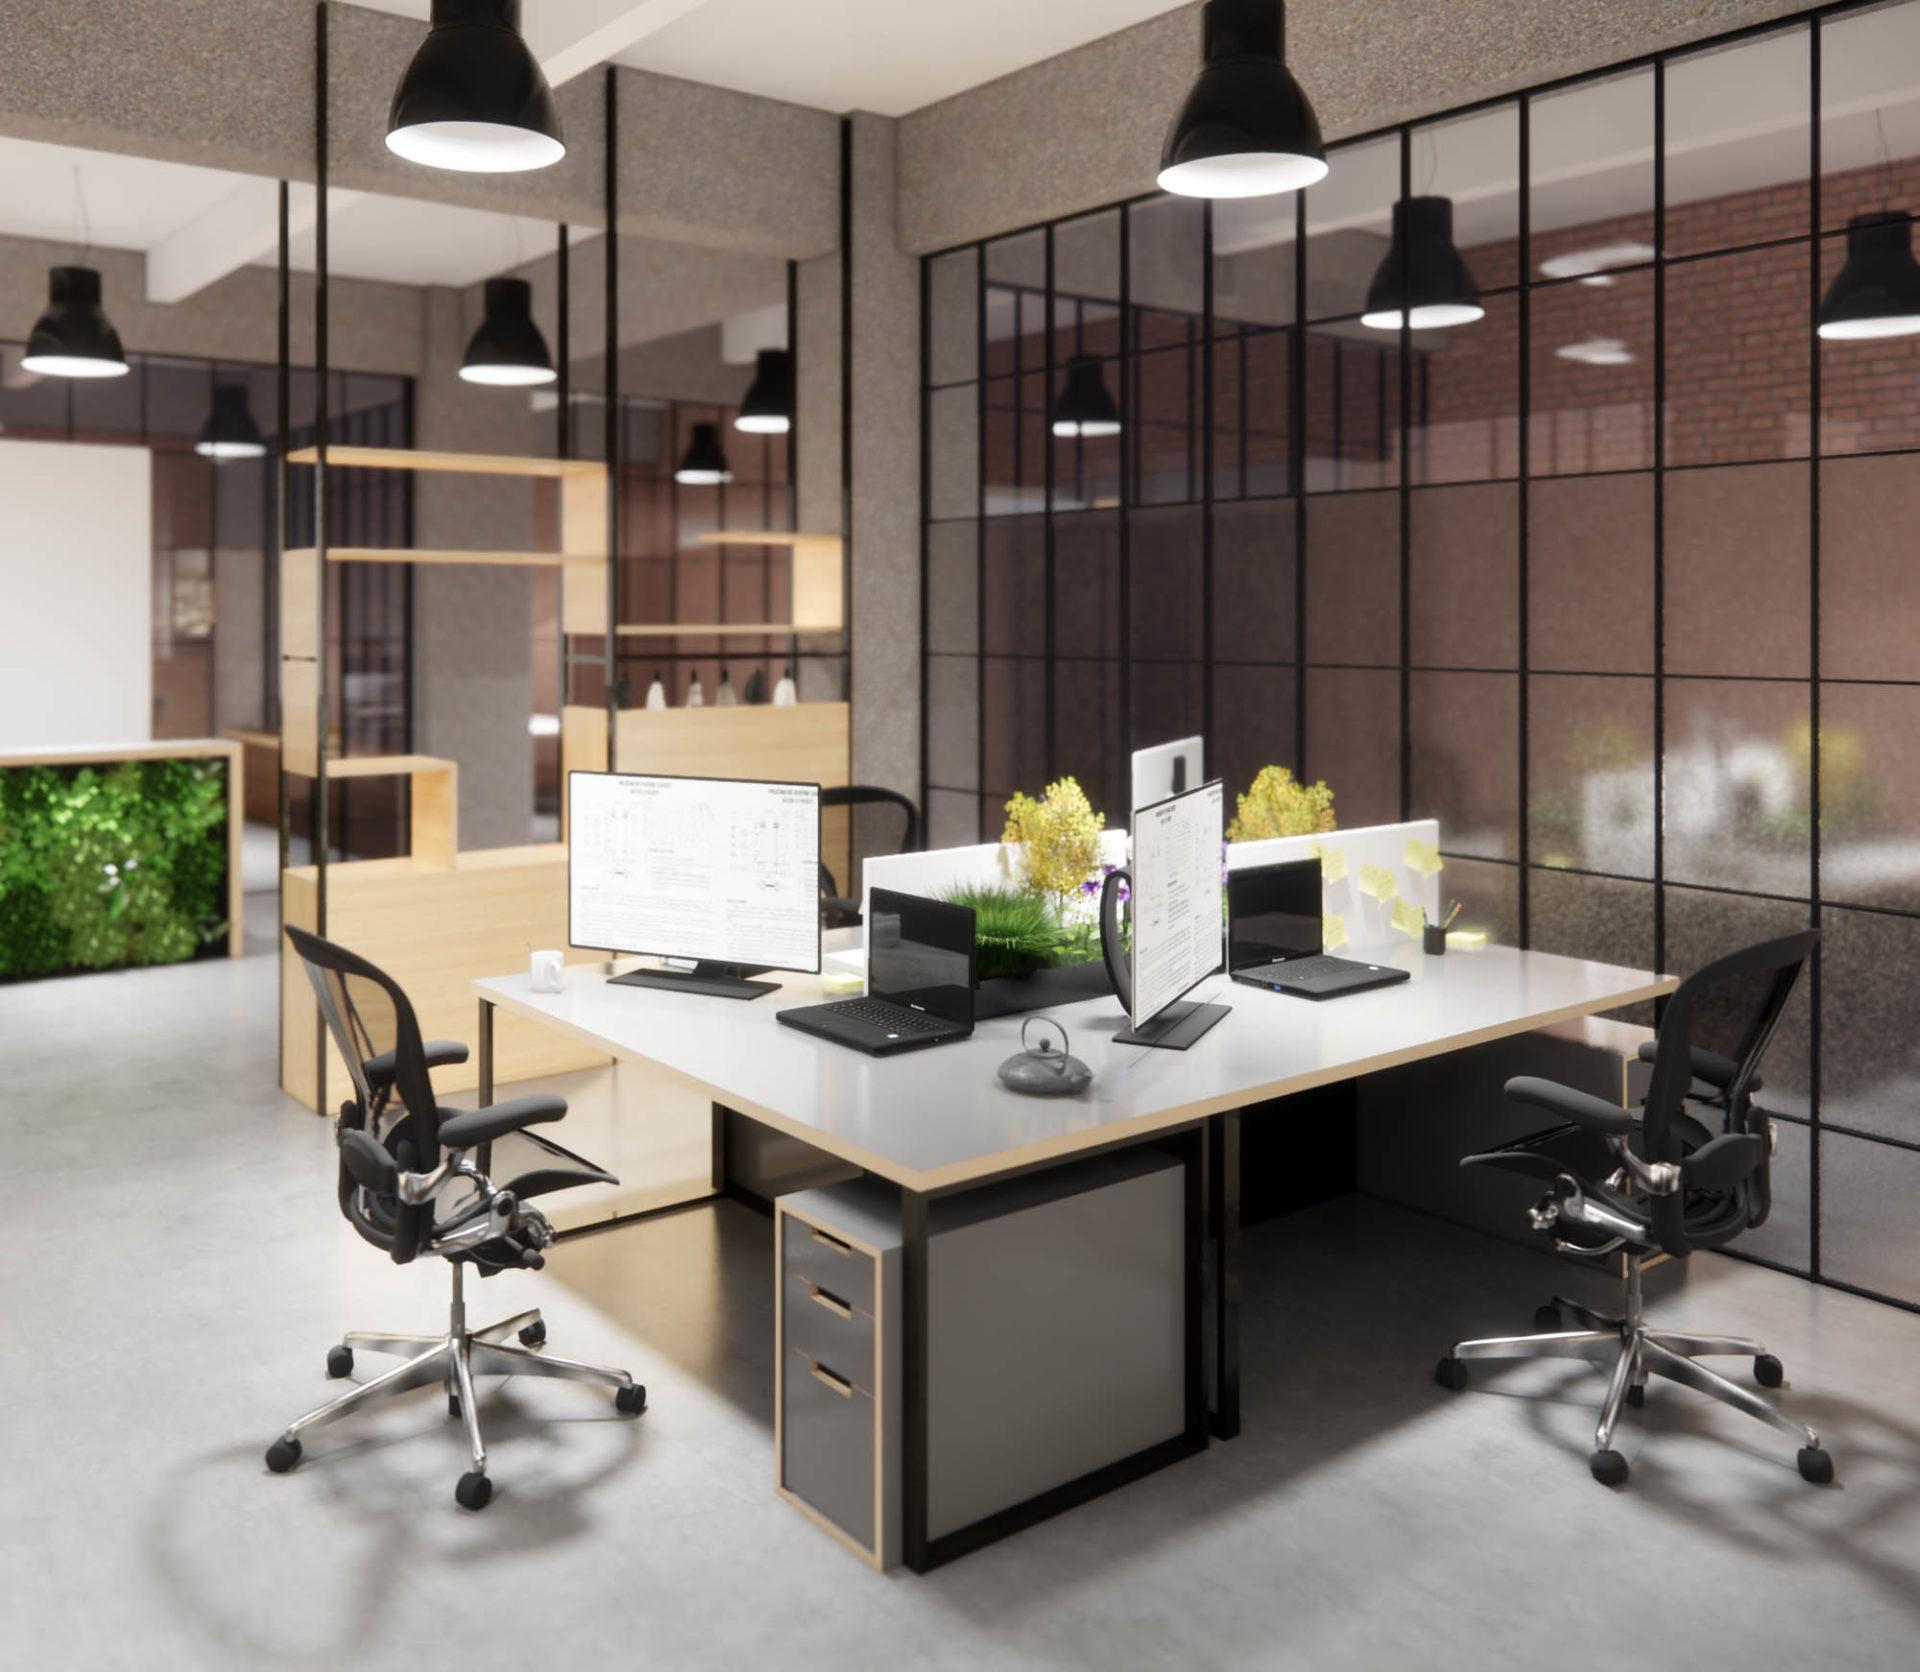 Office, návrh kanceláře, instore design, design interiéru, industrial design